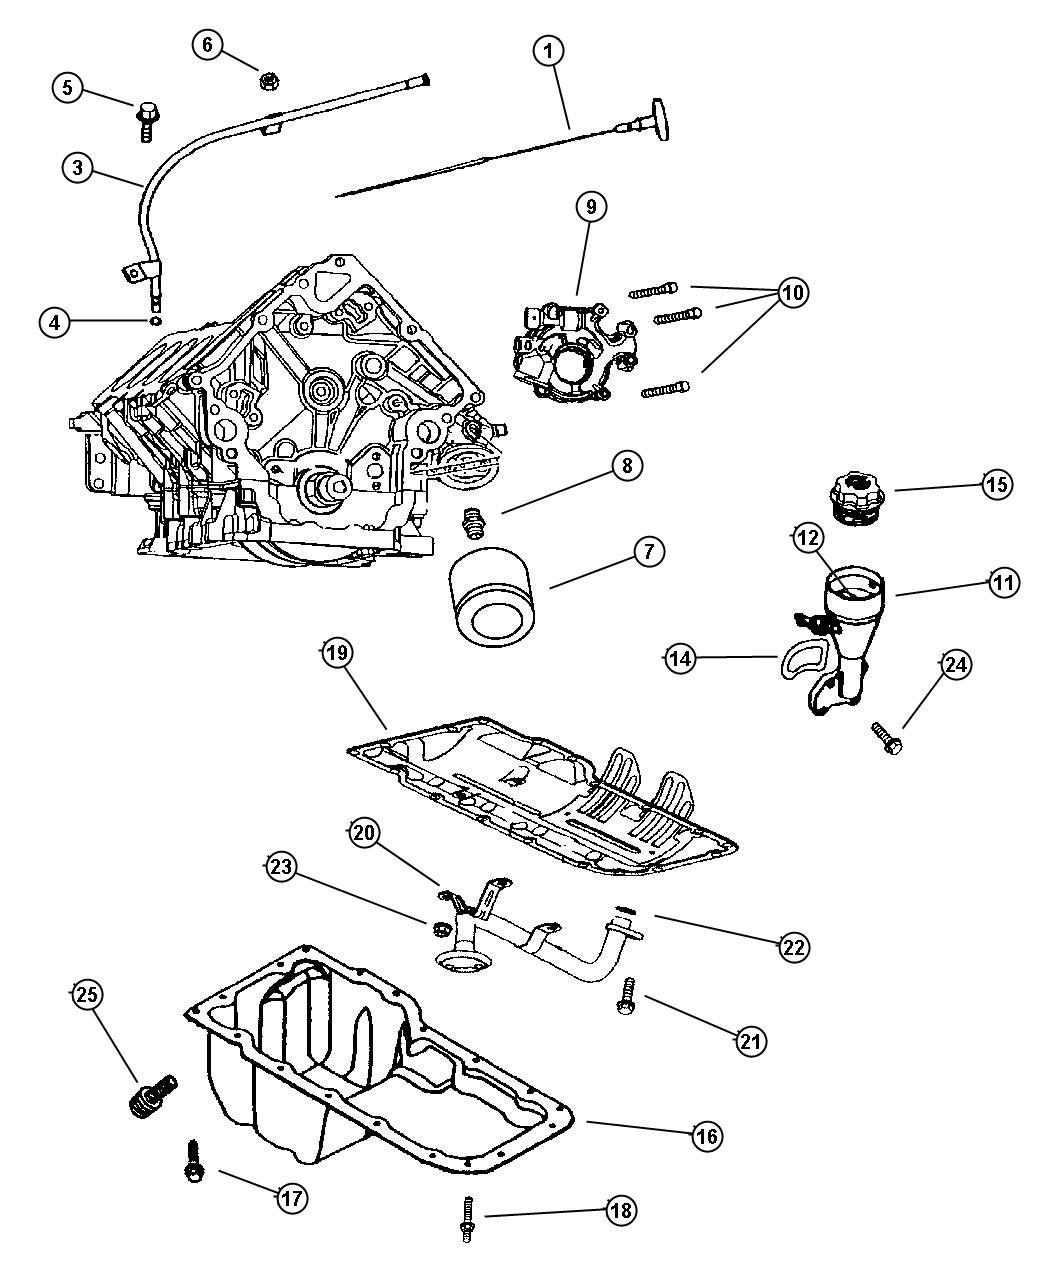 dodge durango alternator wiring diagram 2004 silverado fuse box 2003 belt routing imageresizertool com